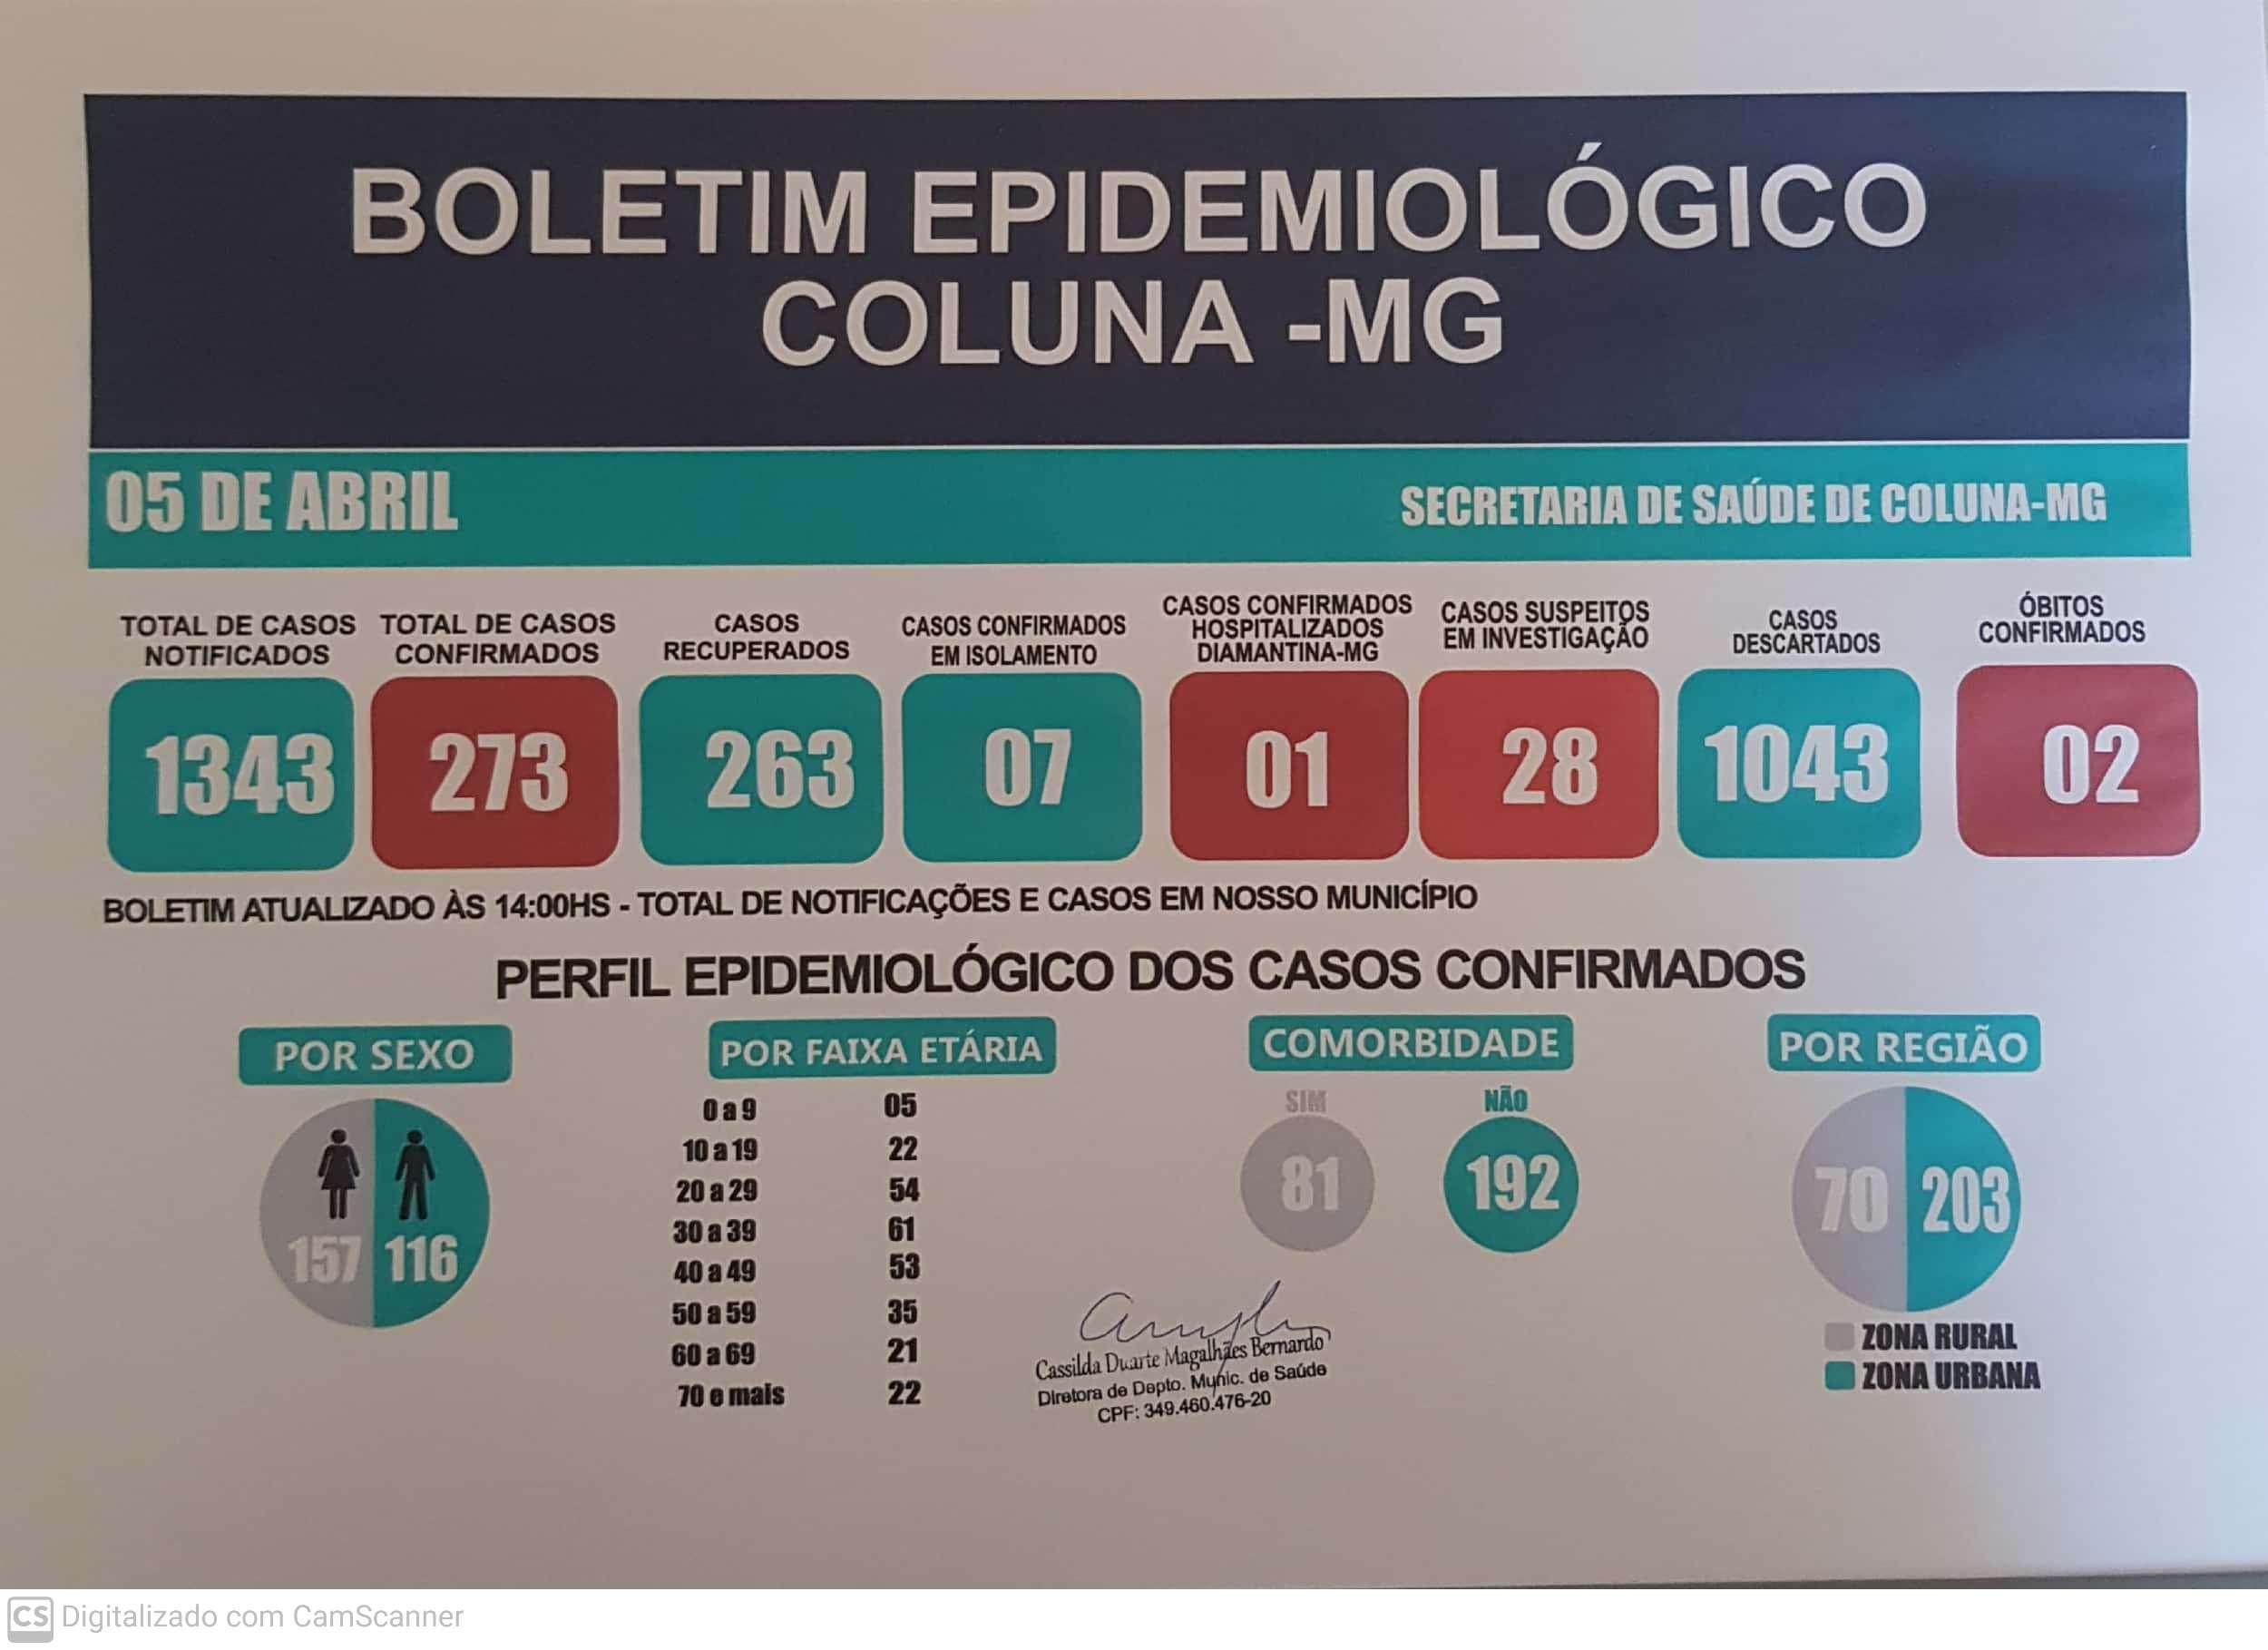 BOLETIM EPIDEMIOLÓGICO COLUNA - MG 05/04/2021